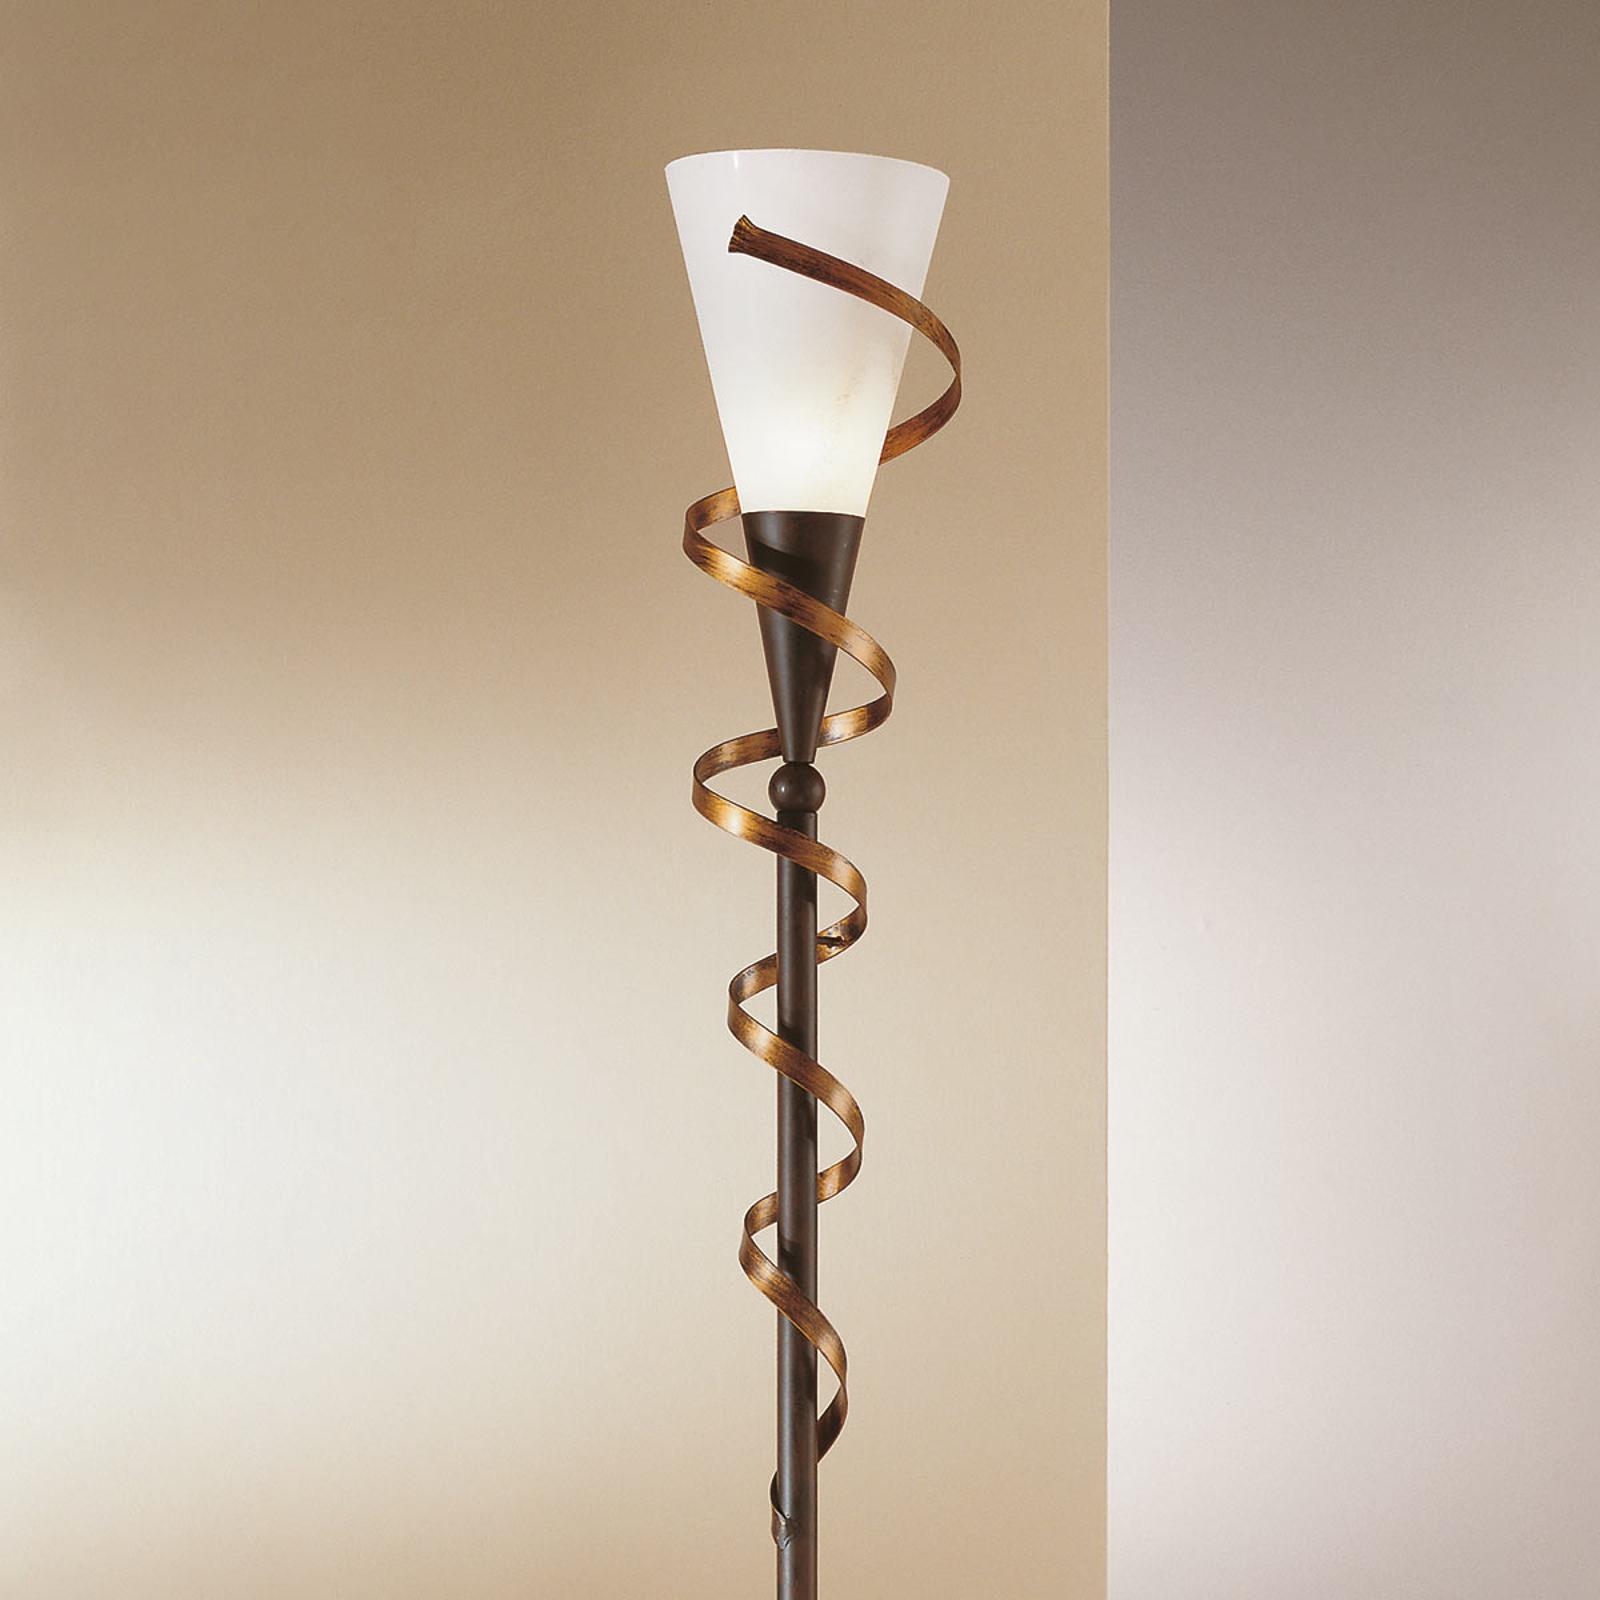 Lampadaire BONITO avec spirale dorée